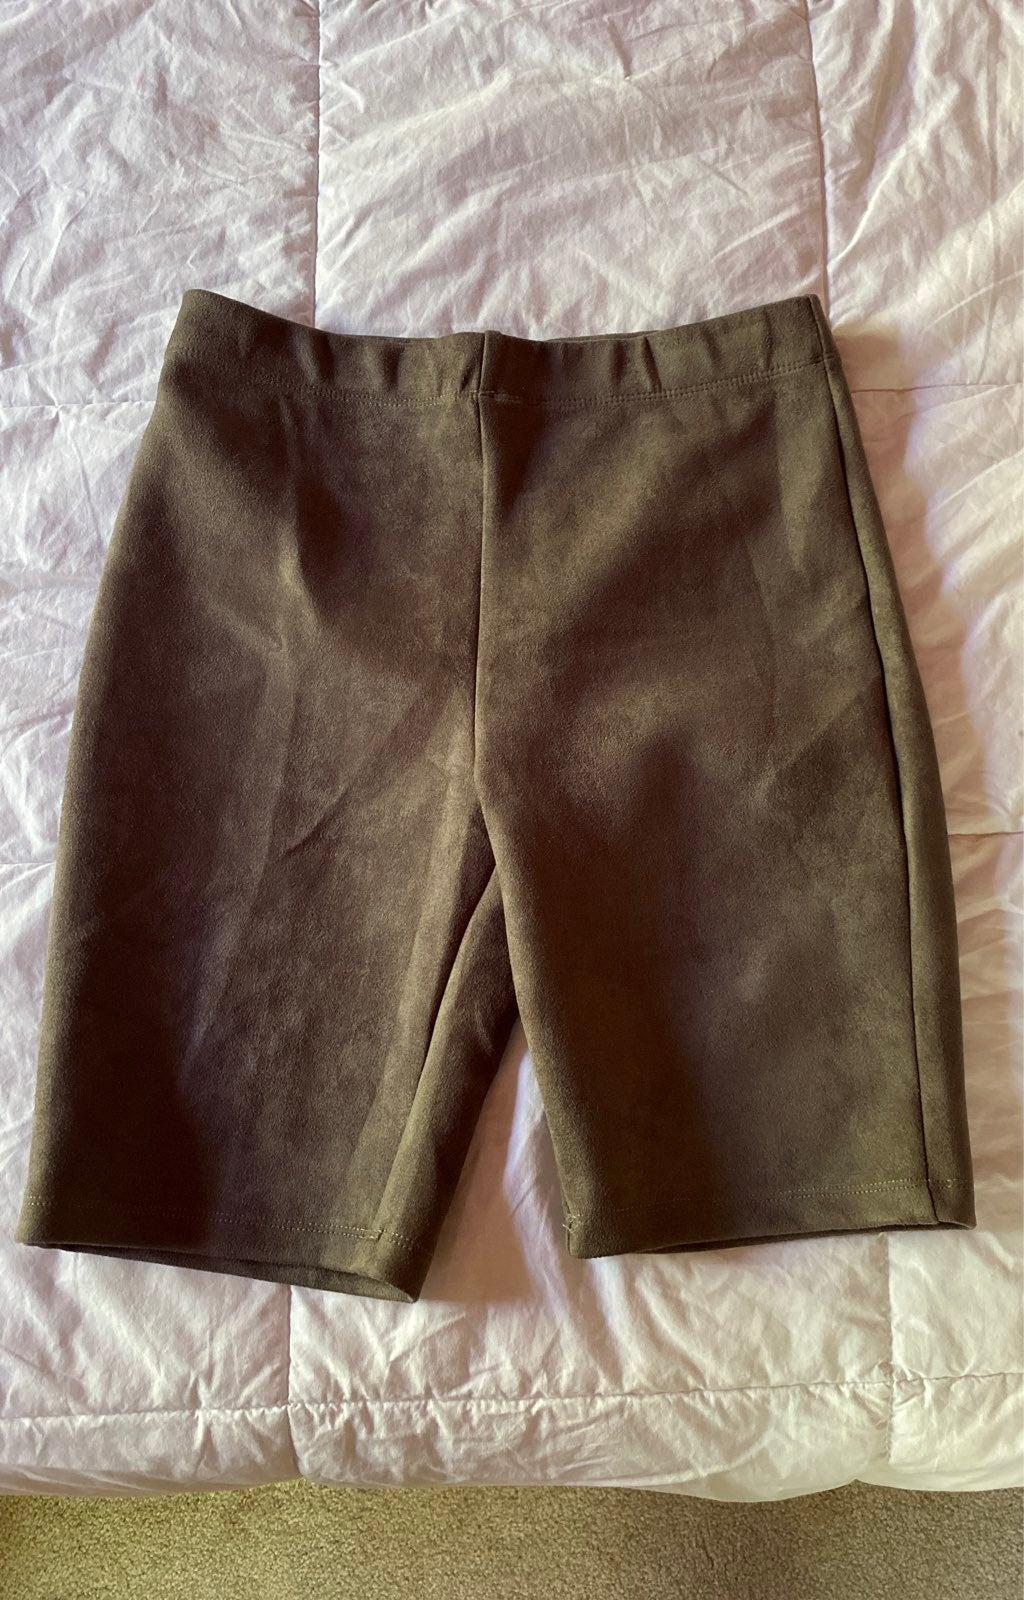 ootdfash biker shorts